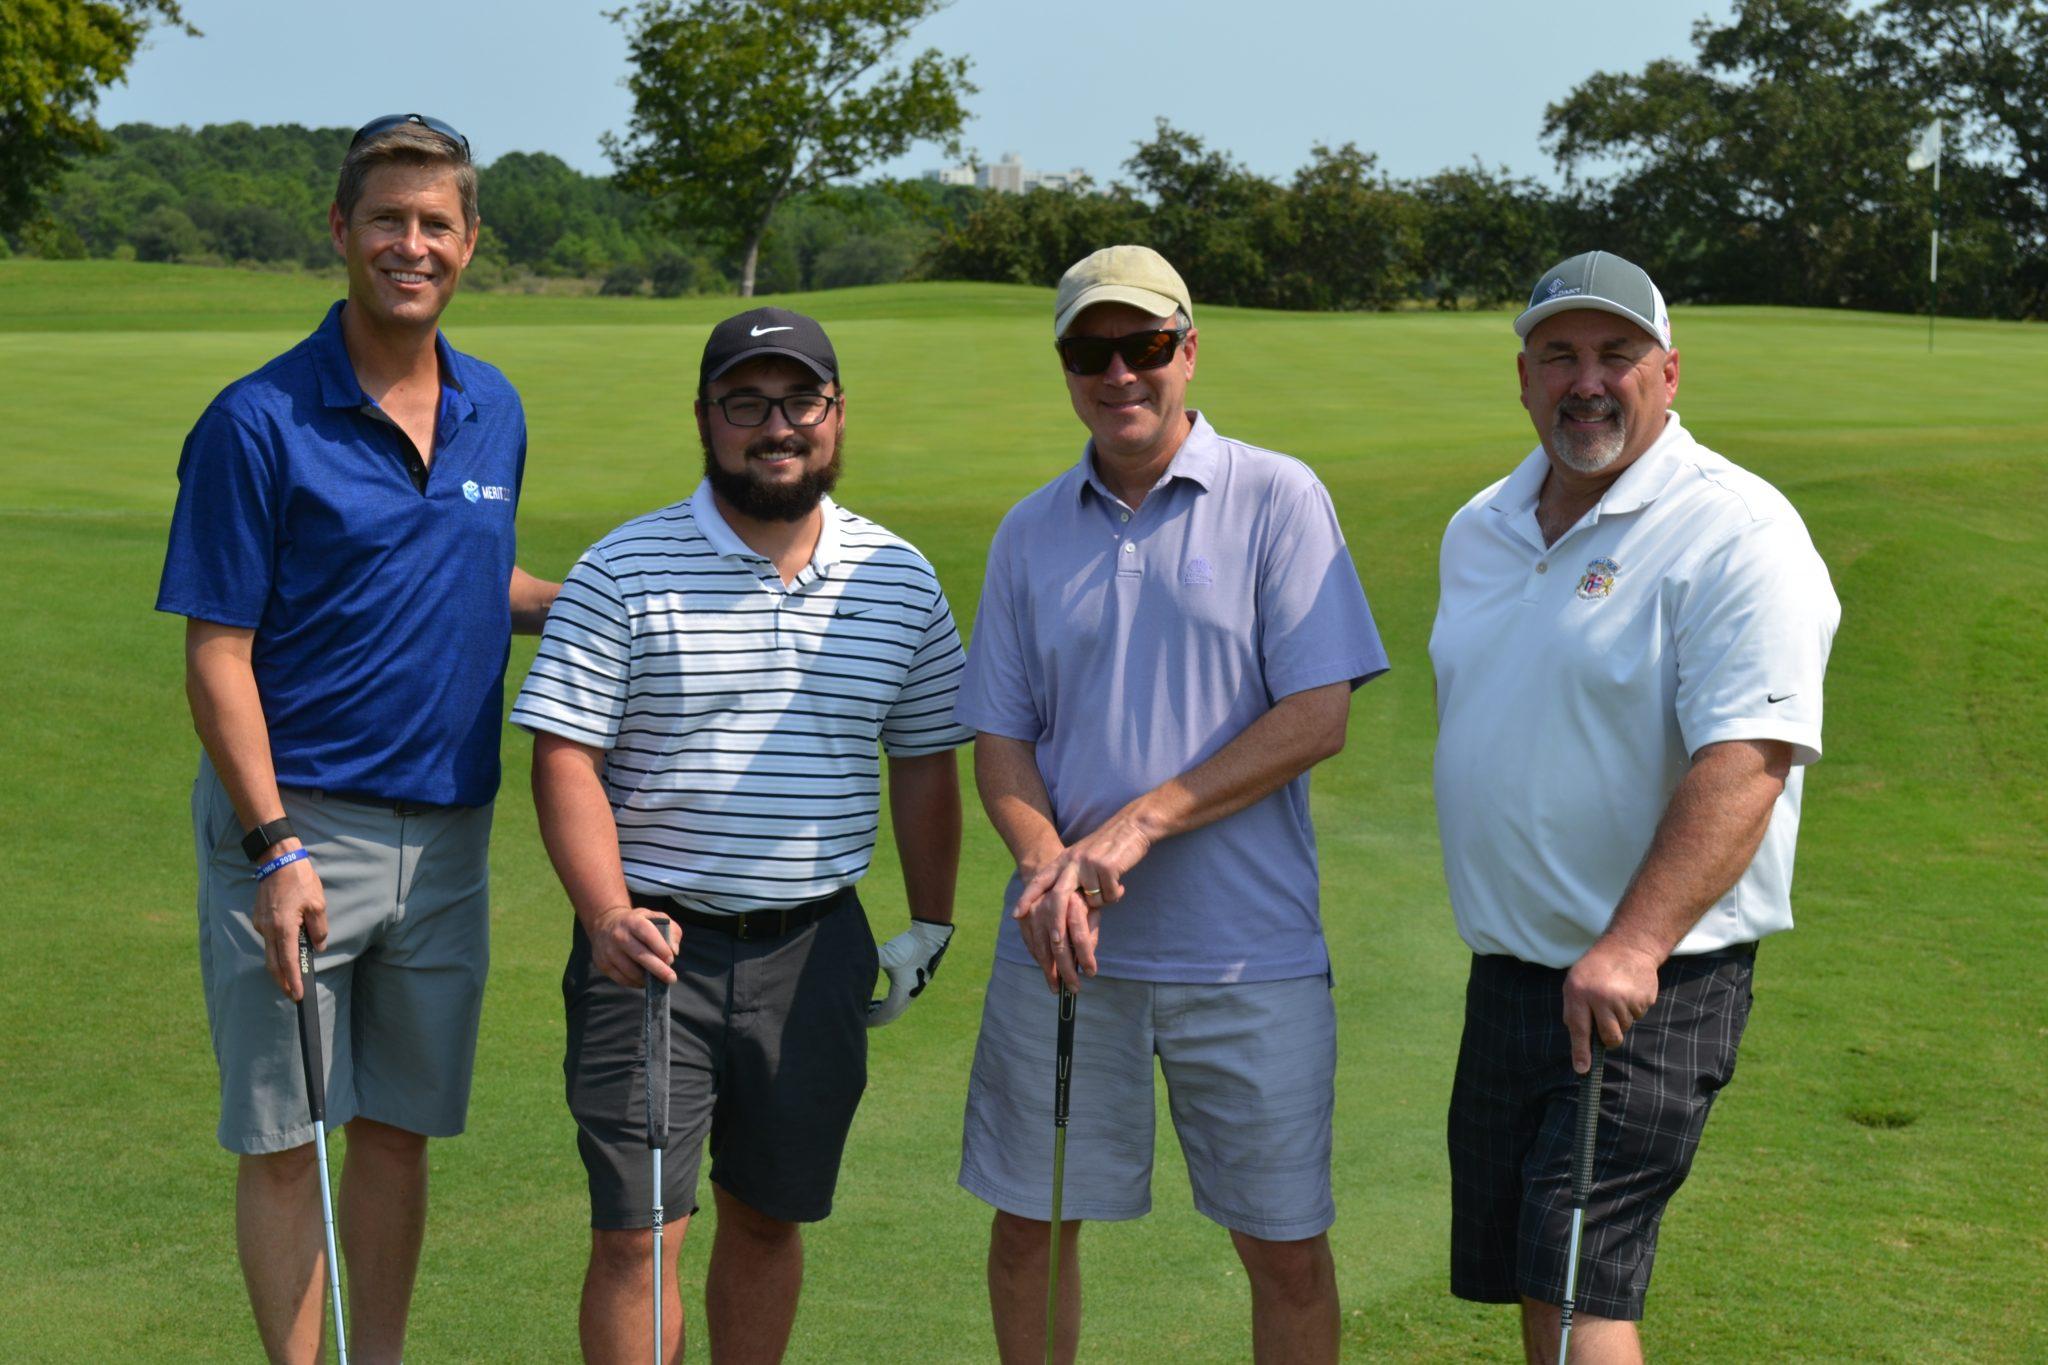 4 Gentlemen posing ater playing Golf in SIA's Golf Tournament